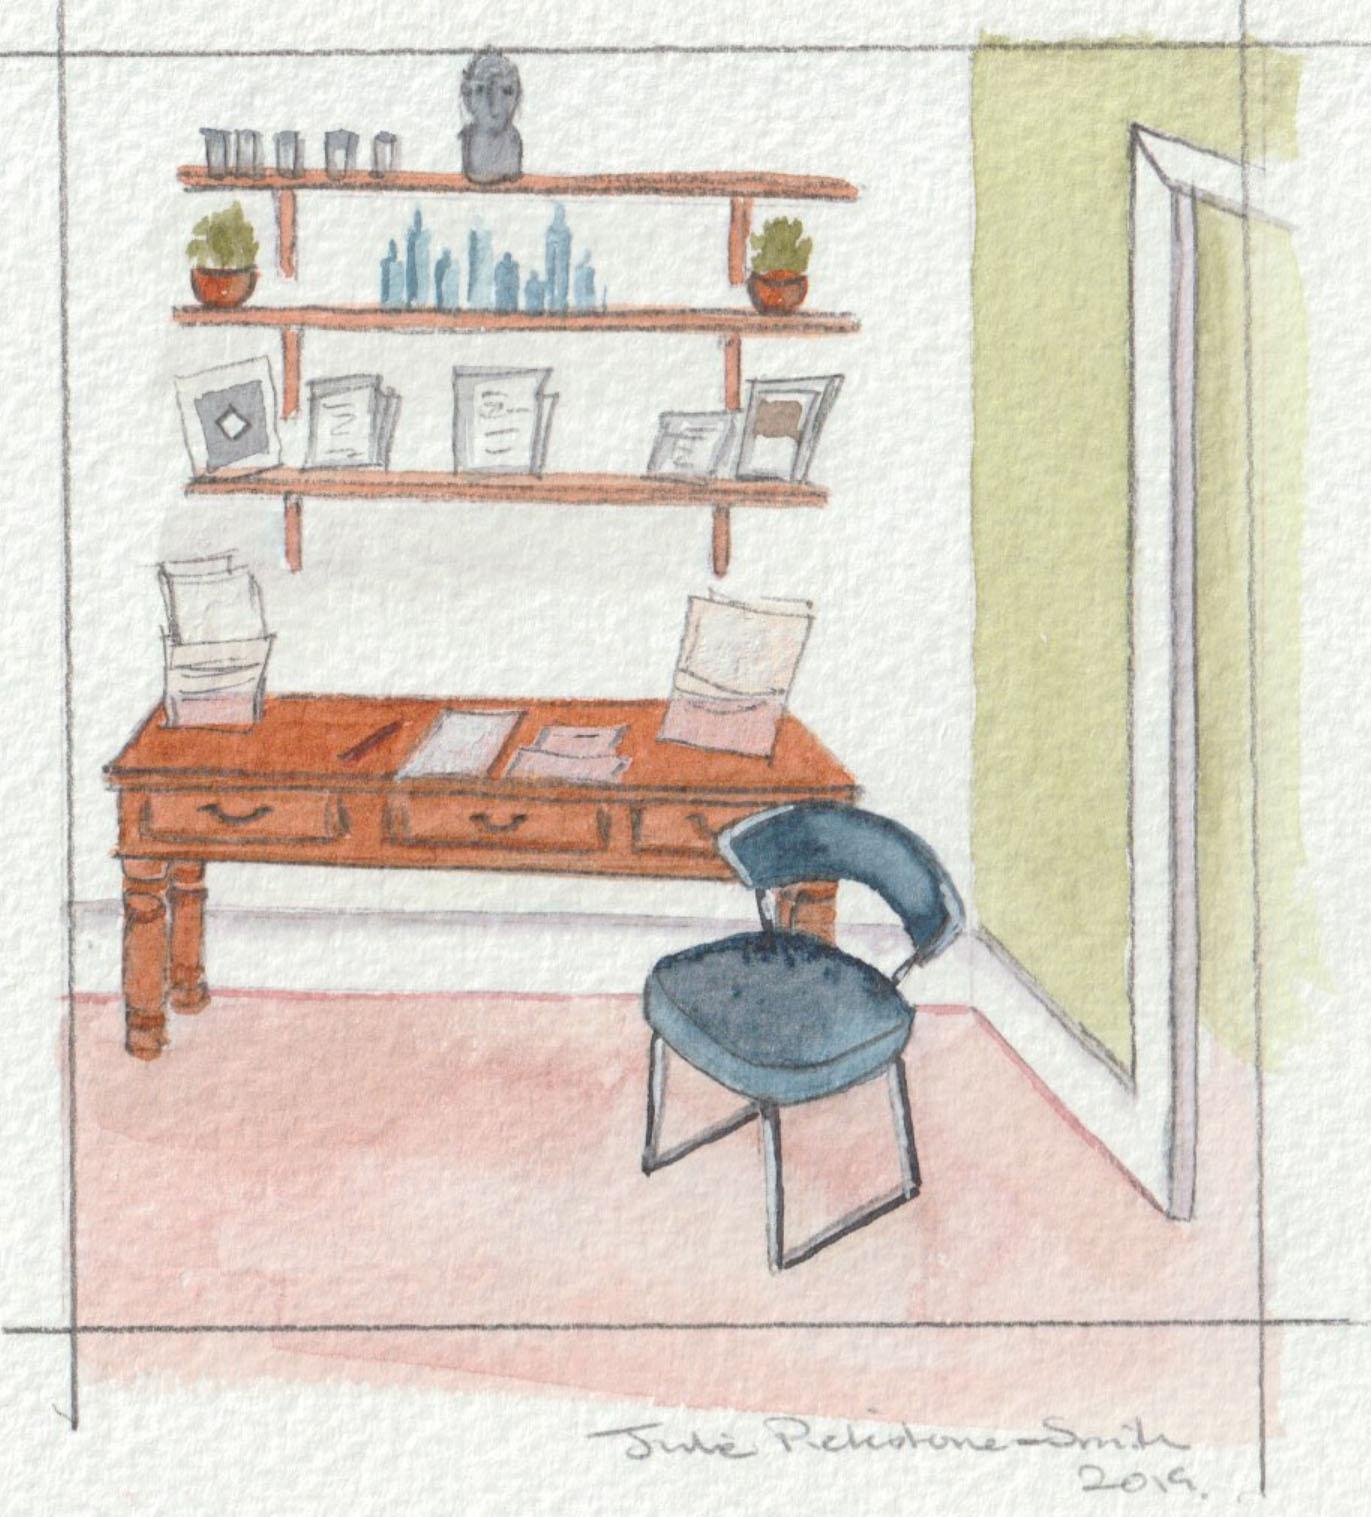 https://integralhealthshrewsbury.com/assets/images/gallery/about-us-3/integral-health-make-over-illustrations-1_thumb.jpg